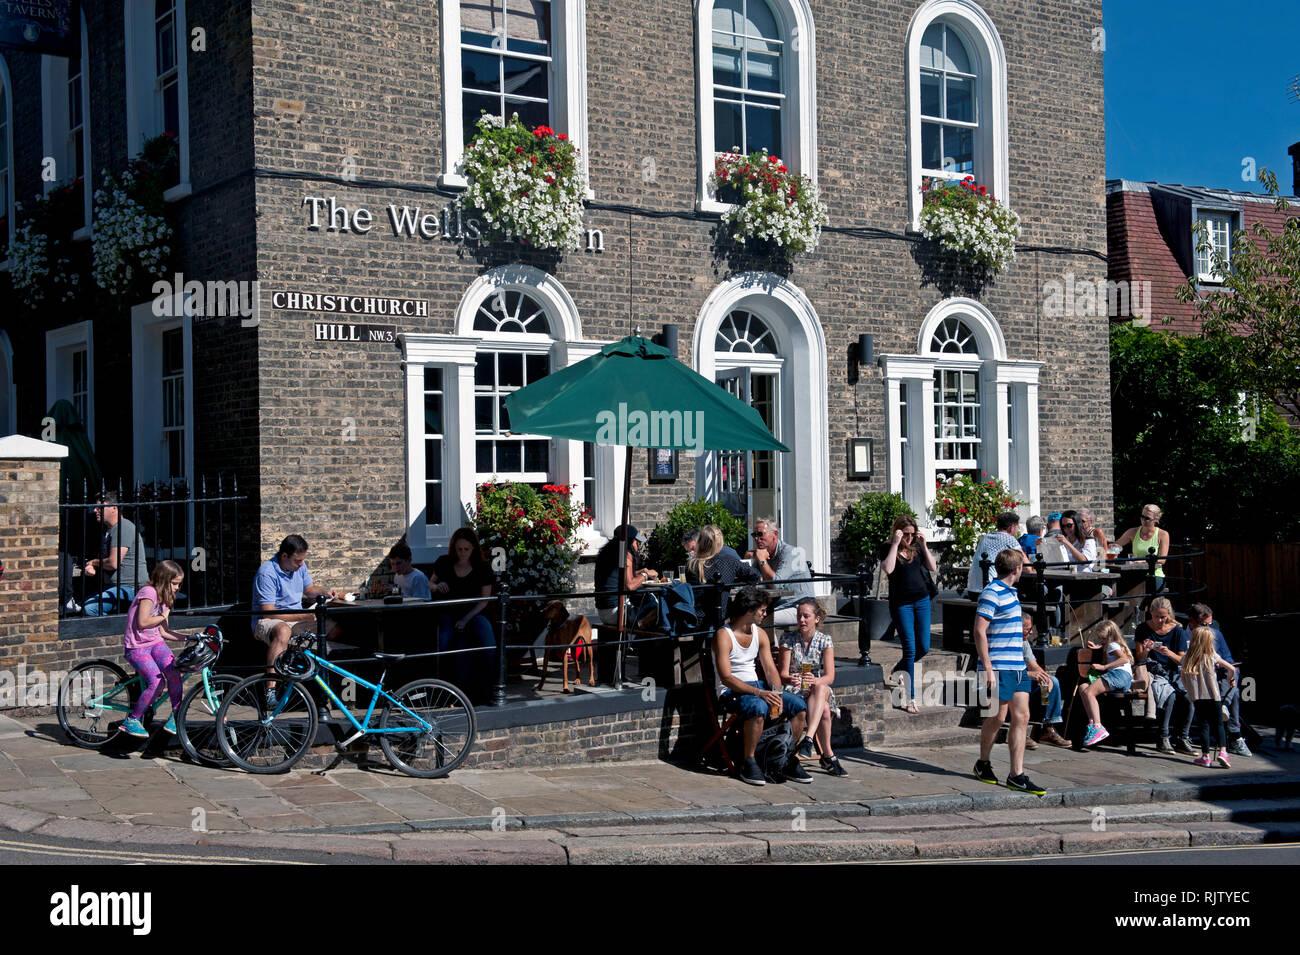 Exterior view of The Wells Tavern pub, Hampstead, London, United Kingdom - Stock Image